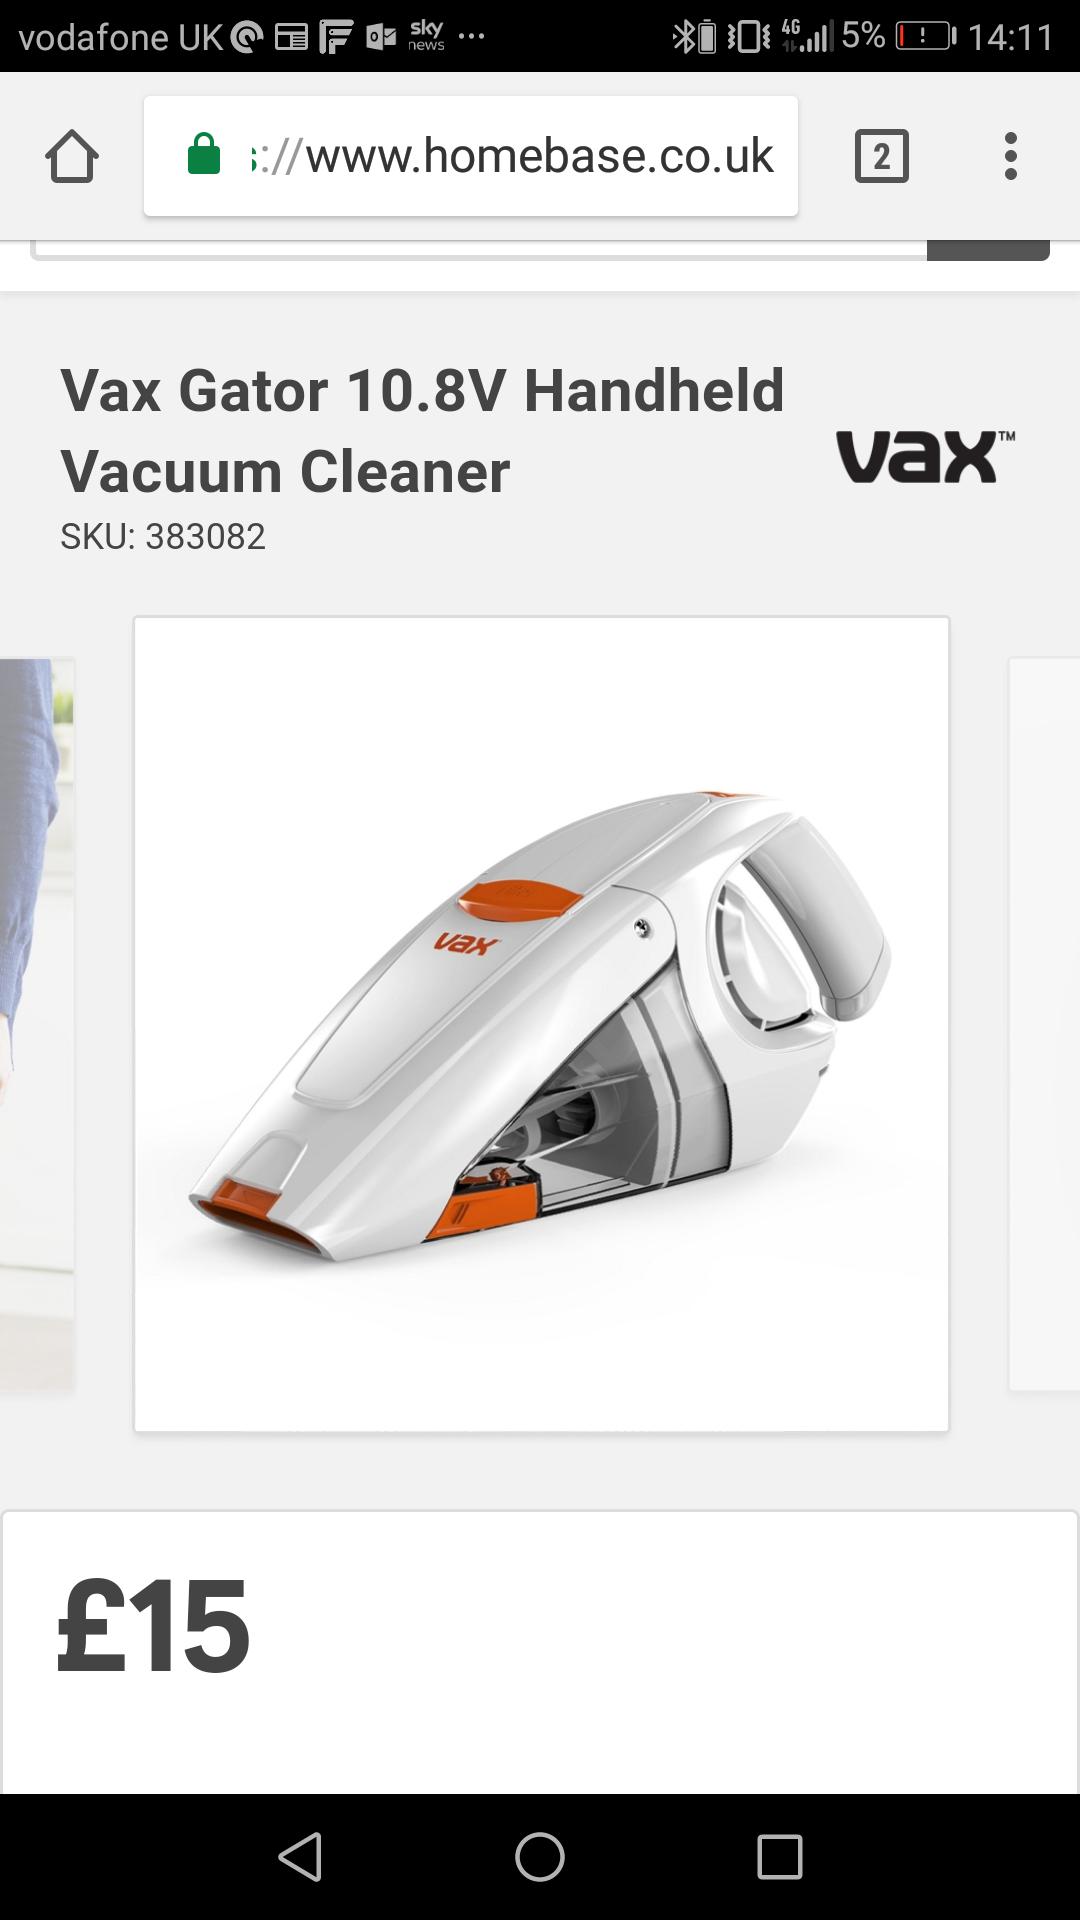 Vax Gator 10.8V handheld vacuum £15 @ Homebase